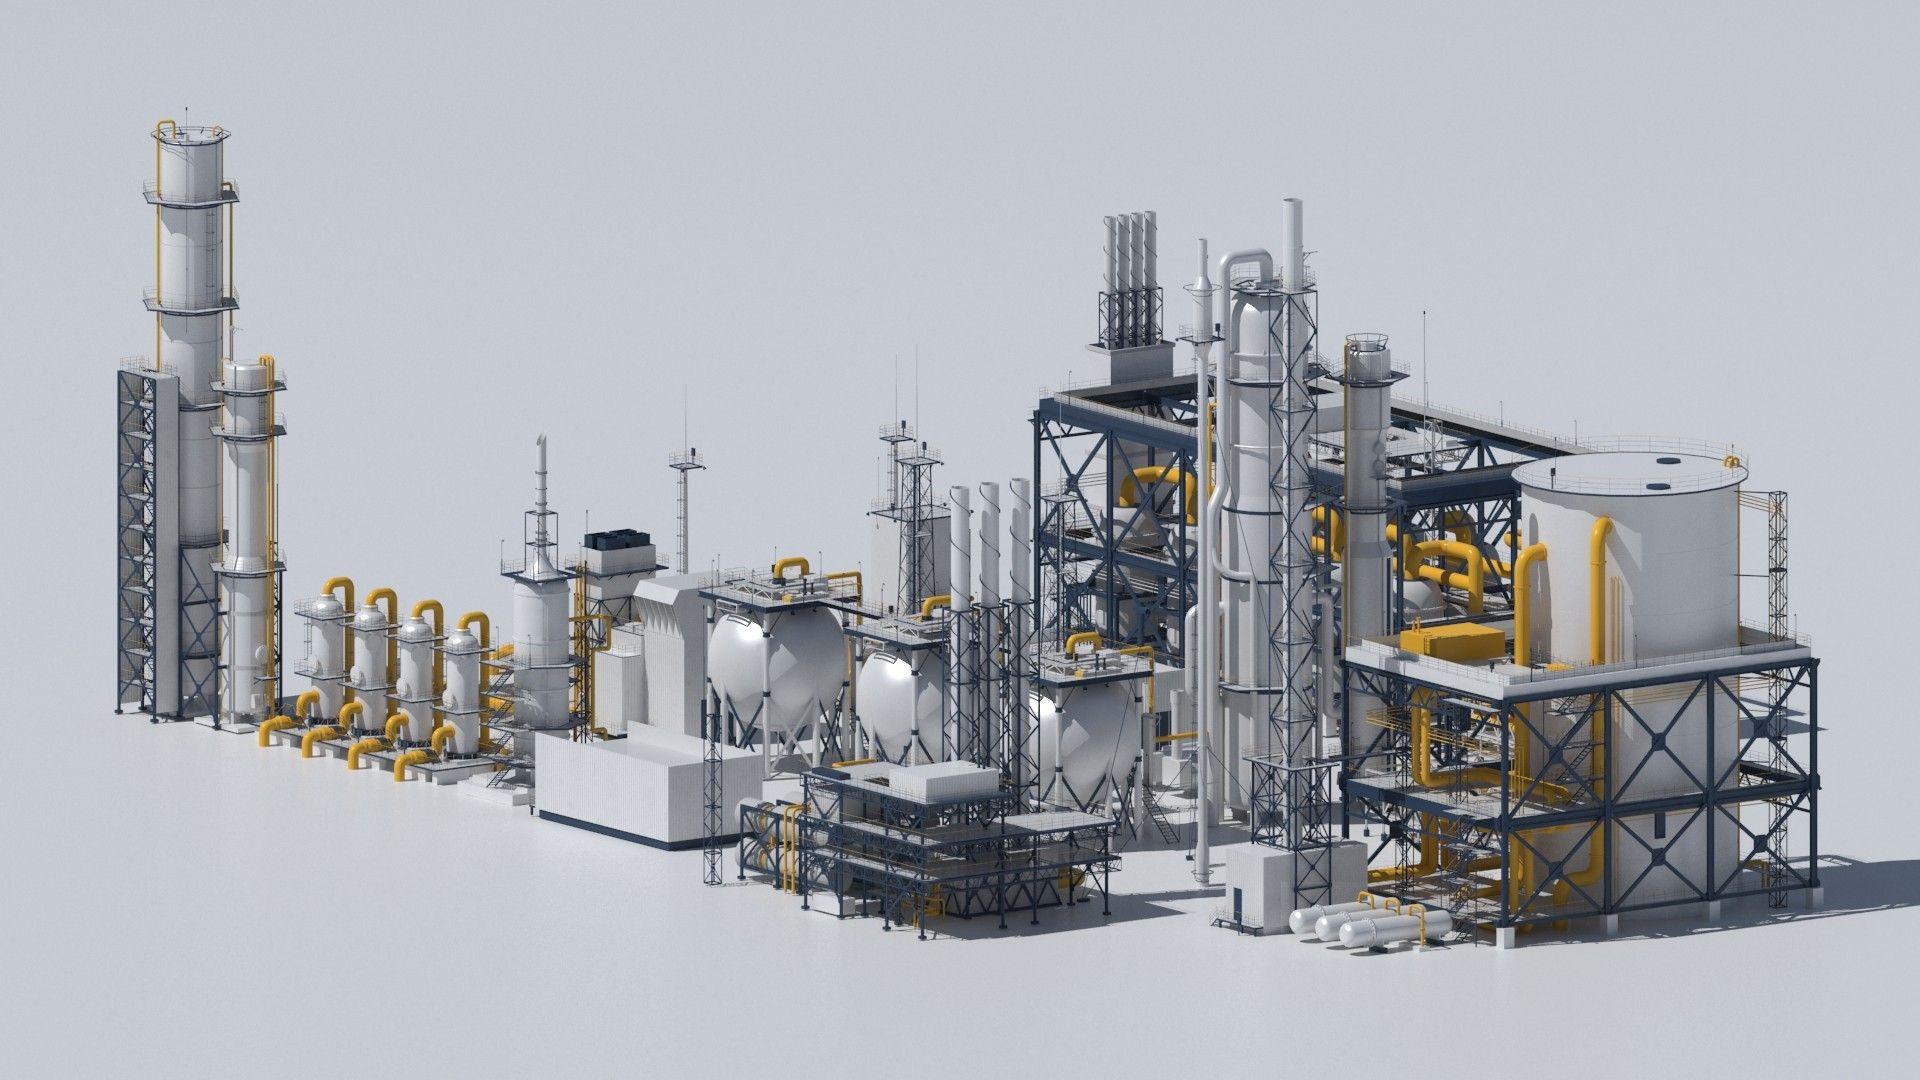 3d factory kitbash | kitbash in 2019 | Industrial